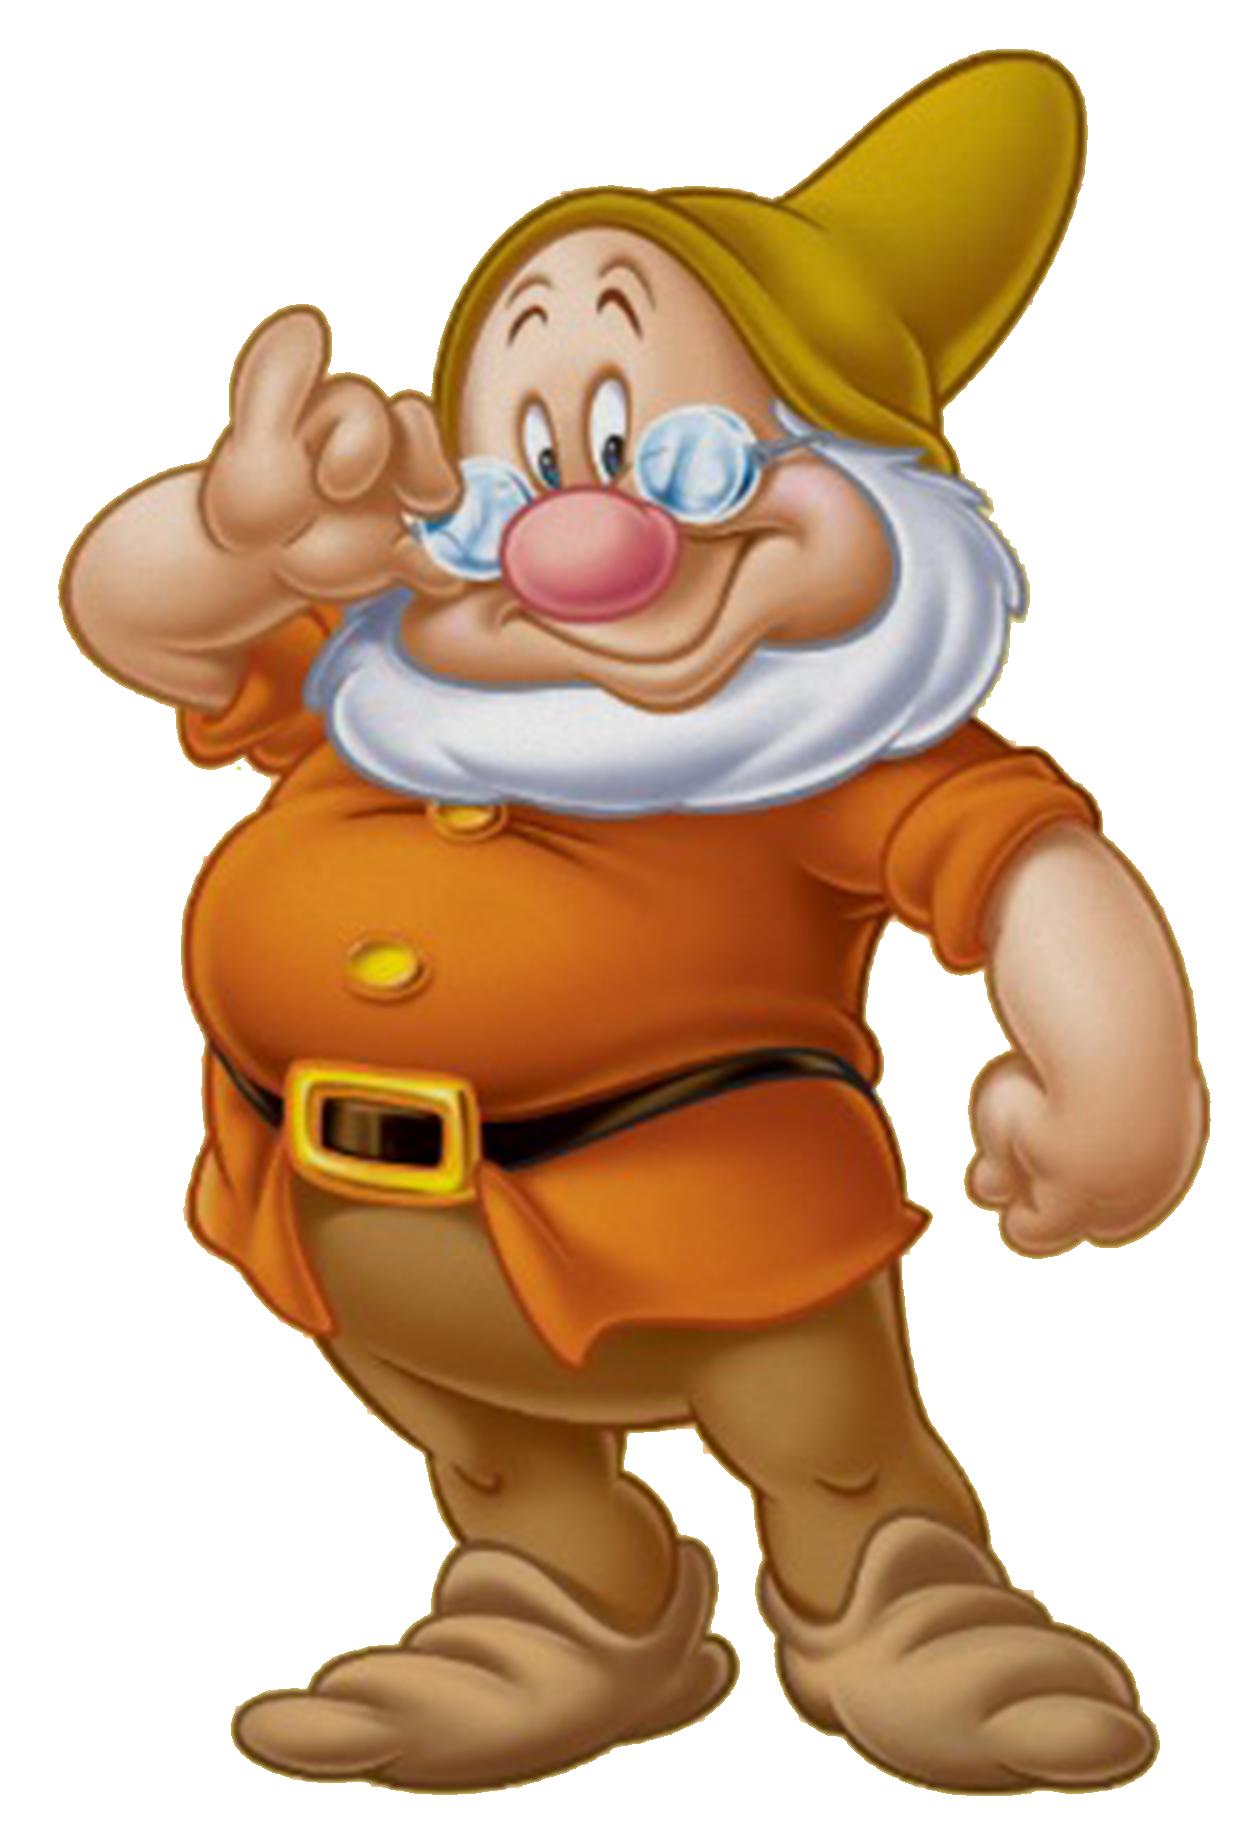 Cottage clipart hansel and gretel. Doc disney wiki fandom